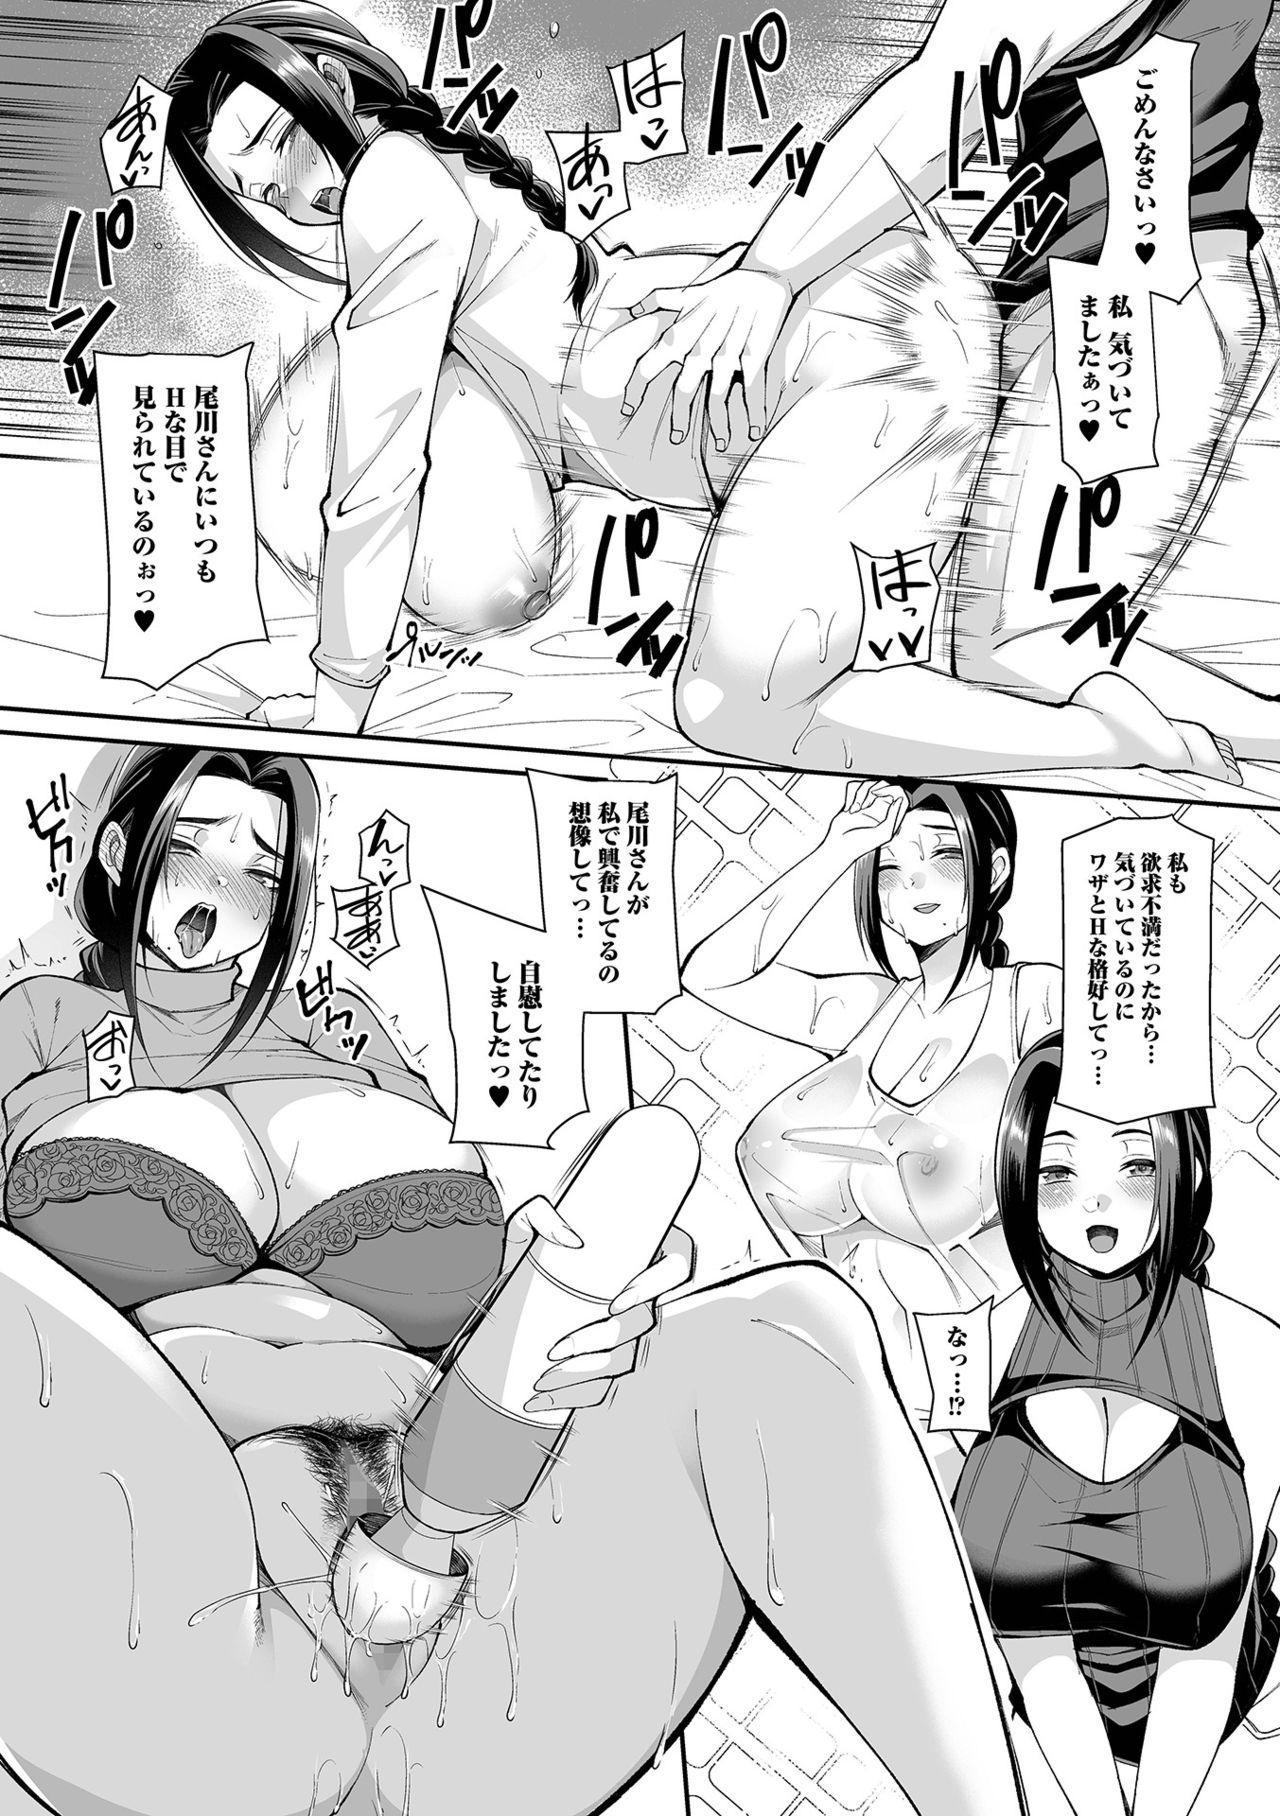 COMIC Shigekiteki SQUIRT!! Vol. 25 119